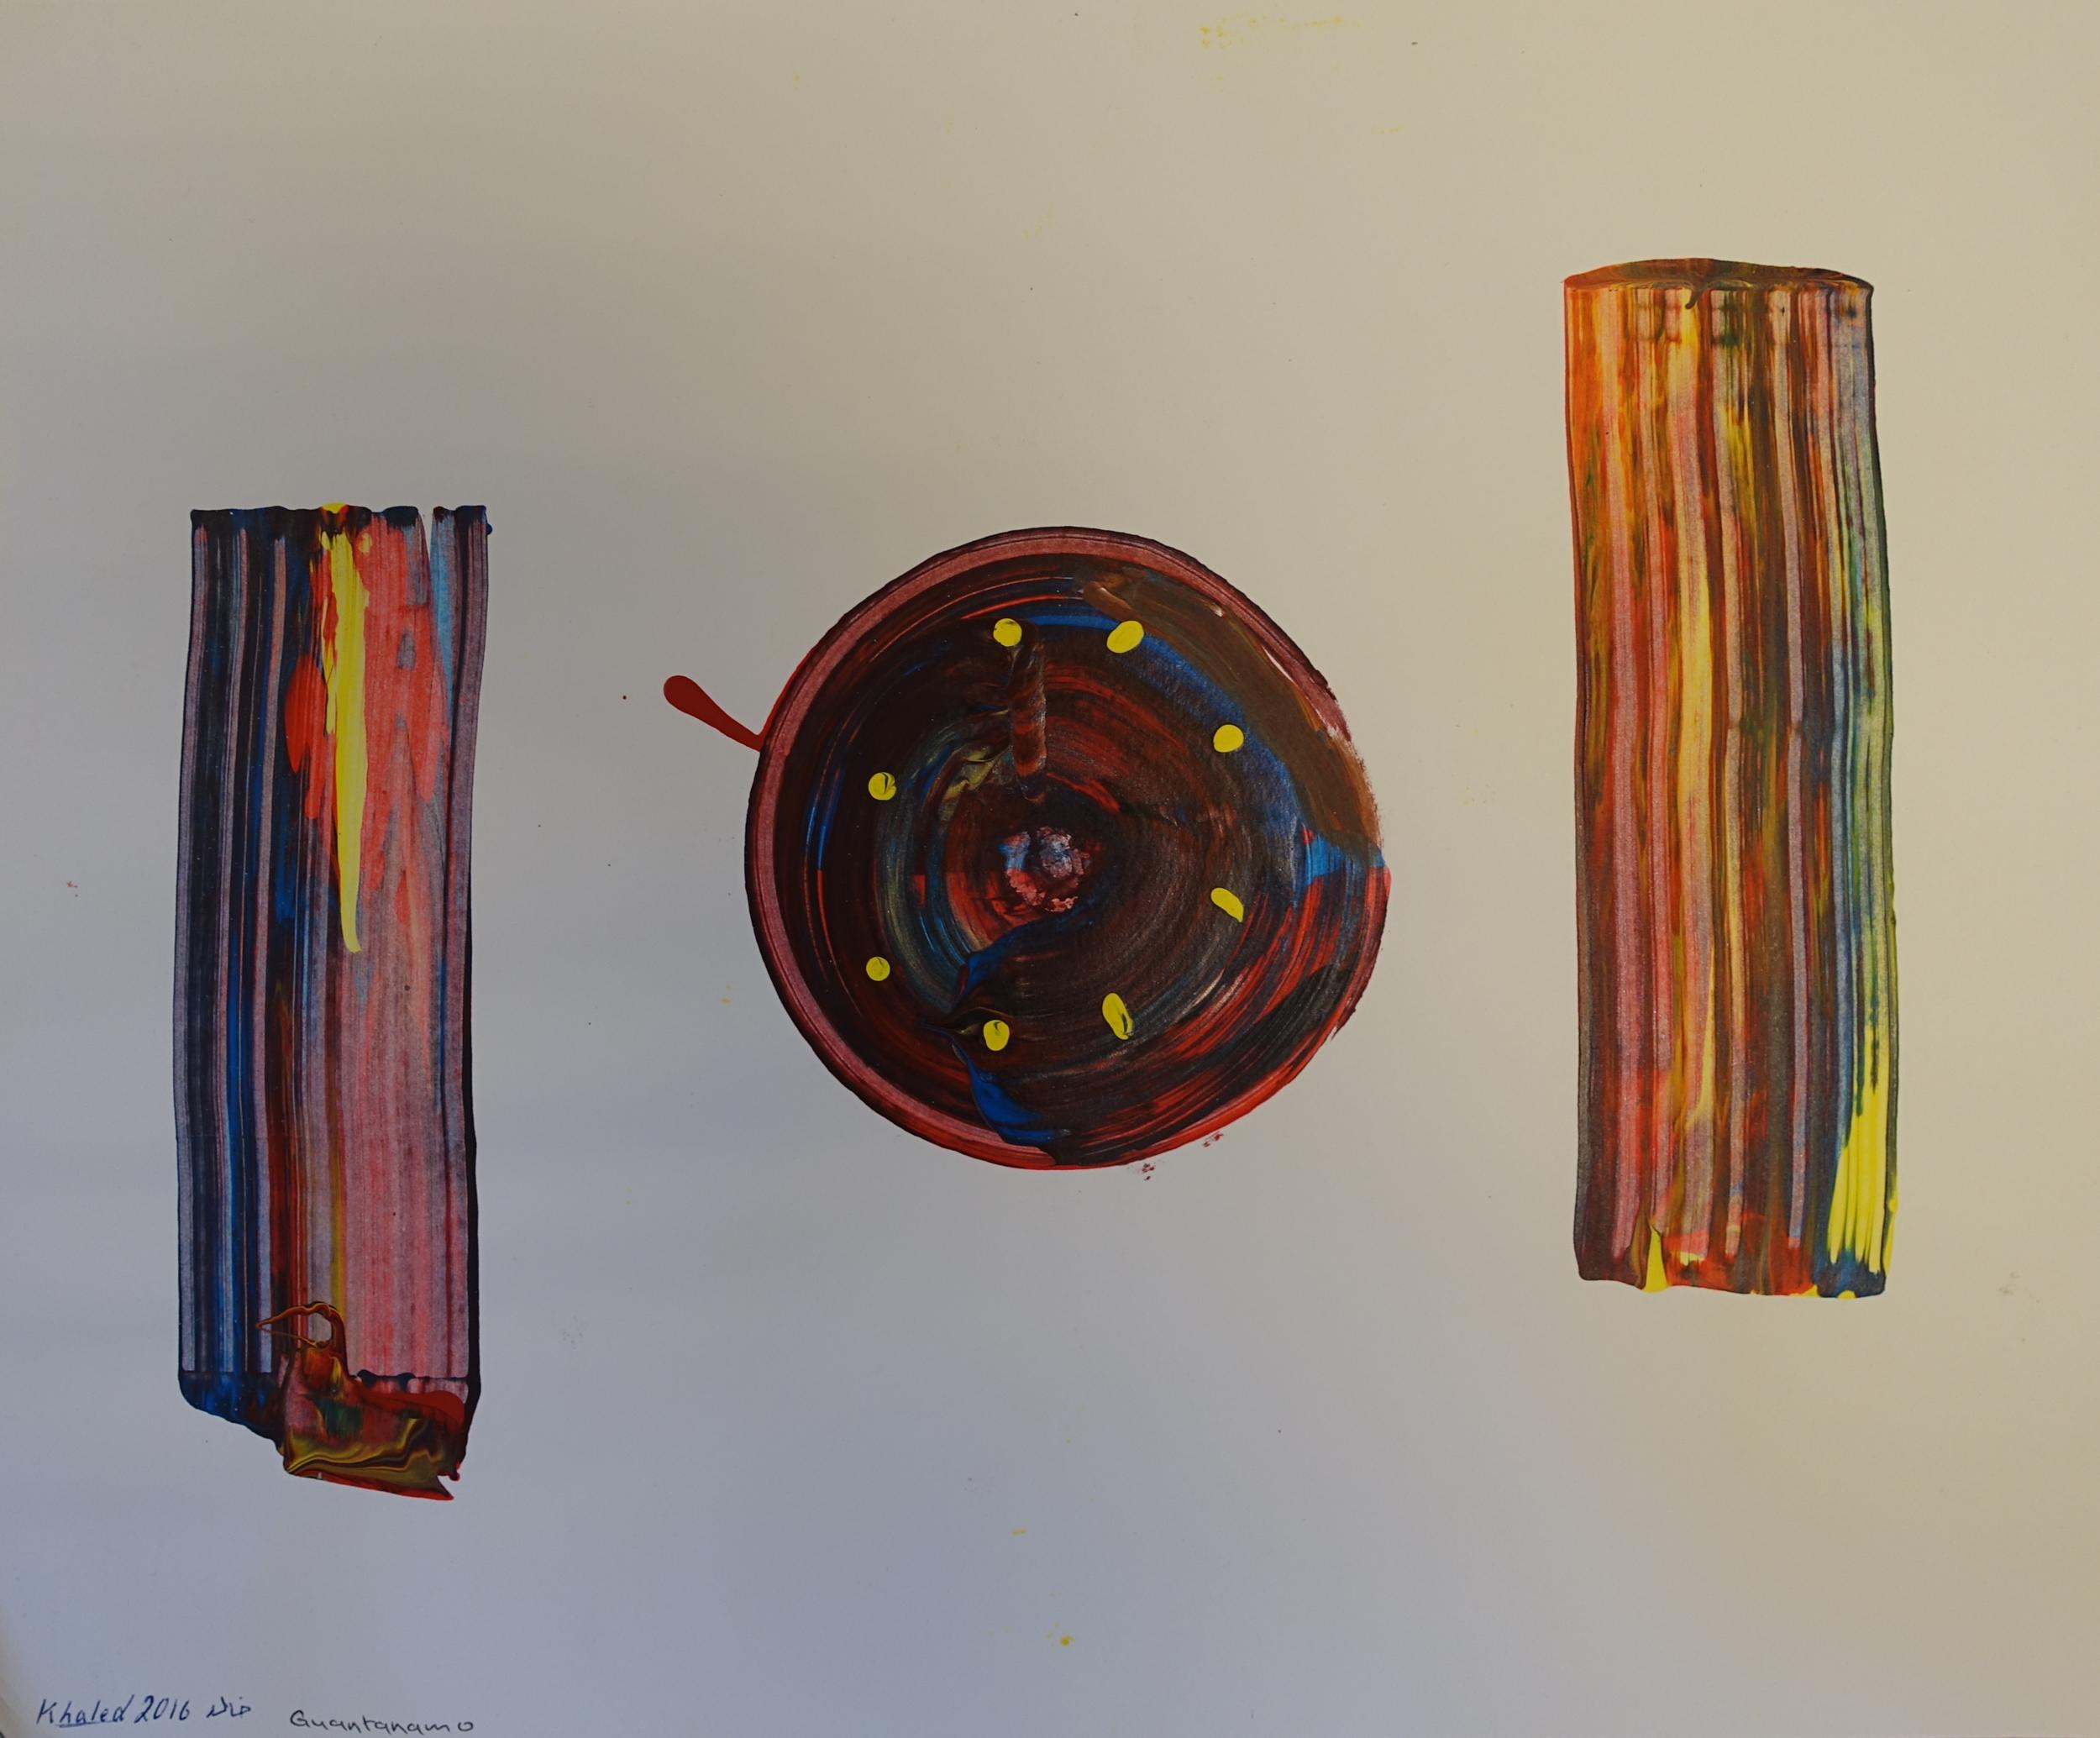 Khalid Qasim, Rectangles and Circle, 2016.